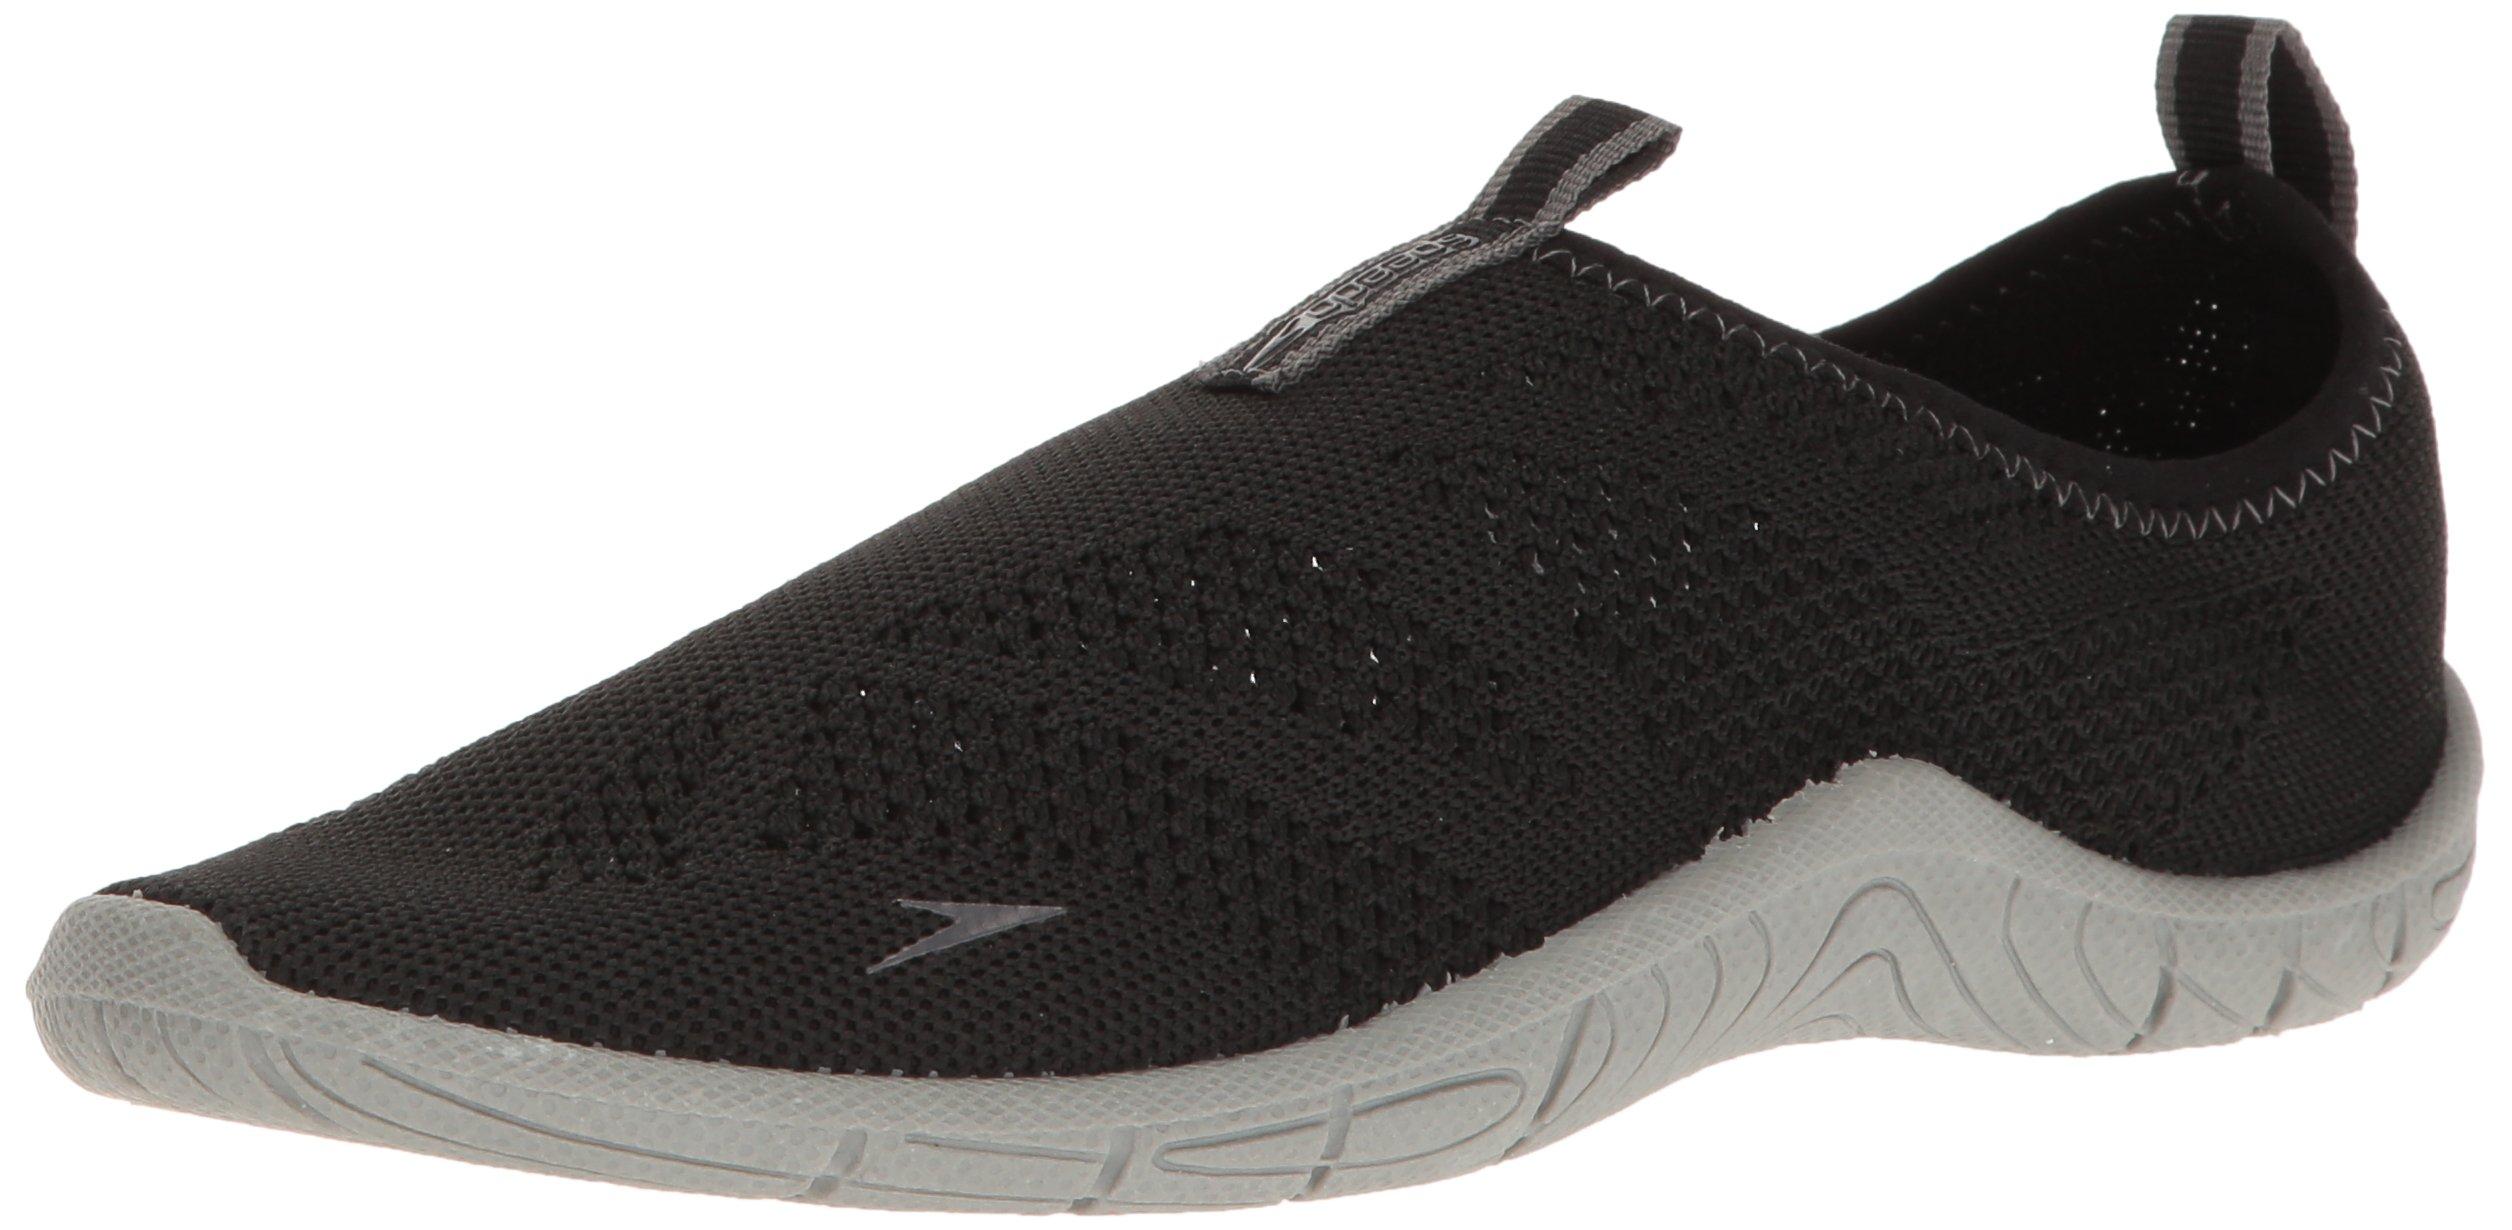 Speedo Women's Surf Knit Athletic Water Shoe, Black/Neutral Grey, 7 C/D US